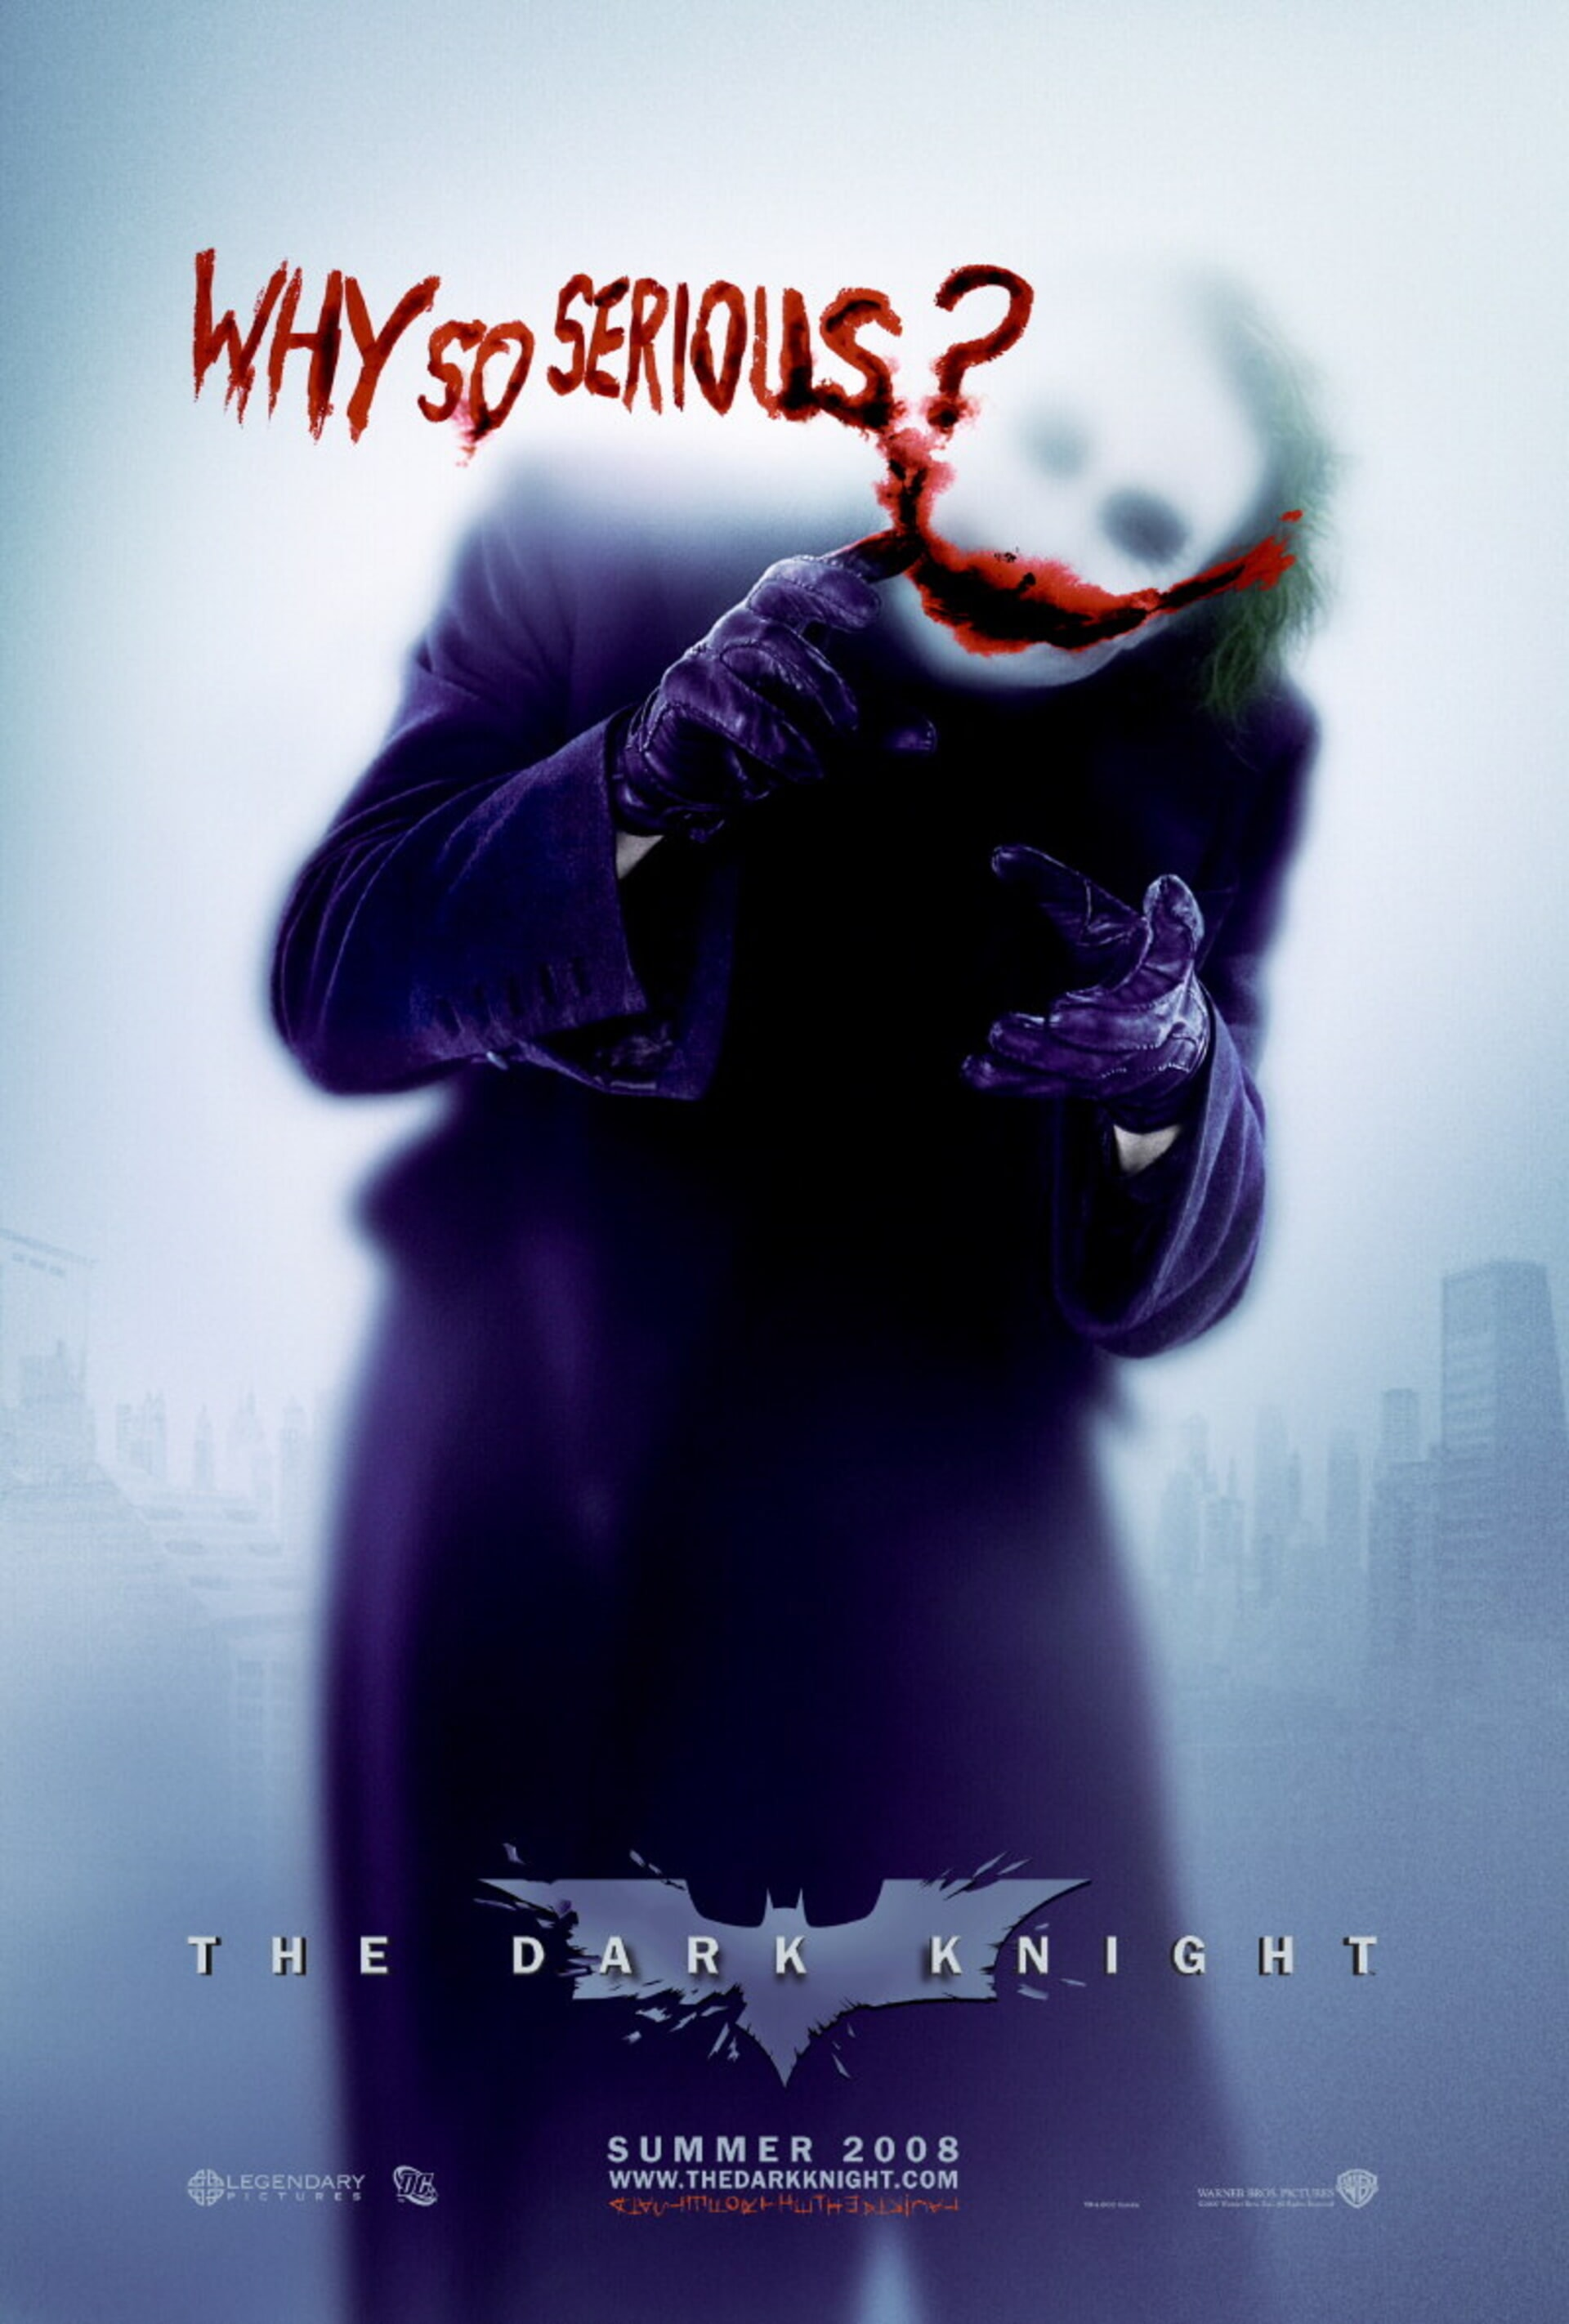 The Dark Knight - Poster 2